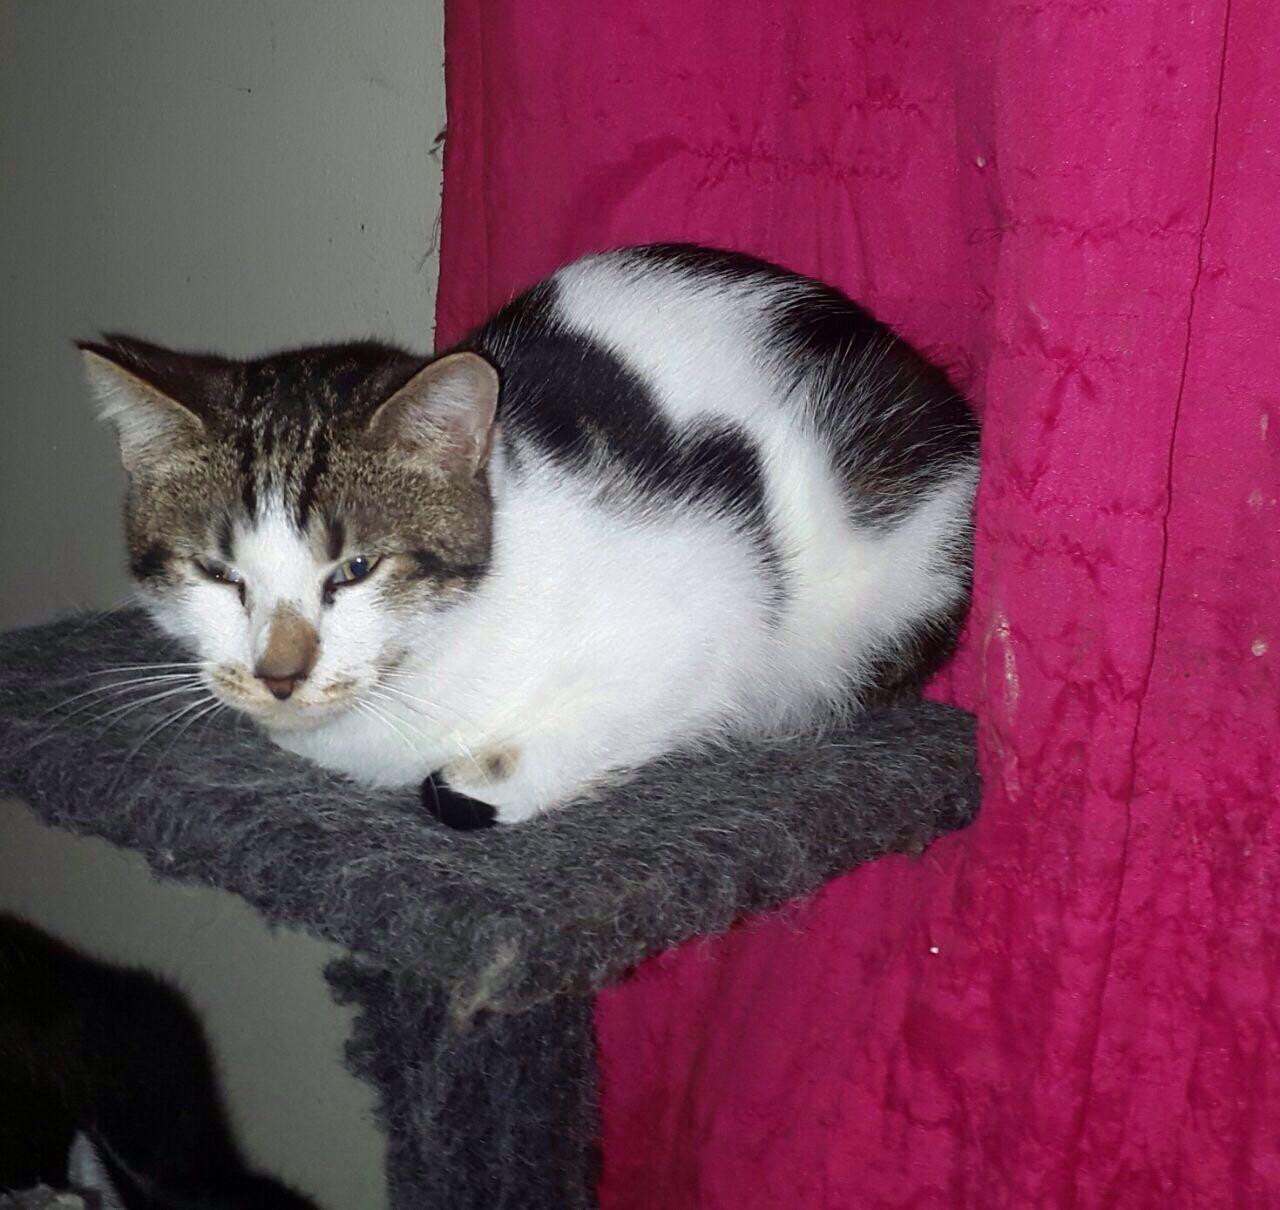 CRO Animal Rescue - Animal Rescue and Pet Adoption Cape Town